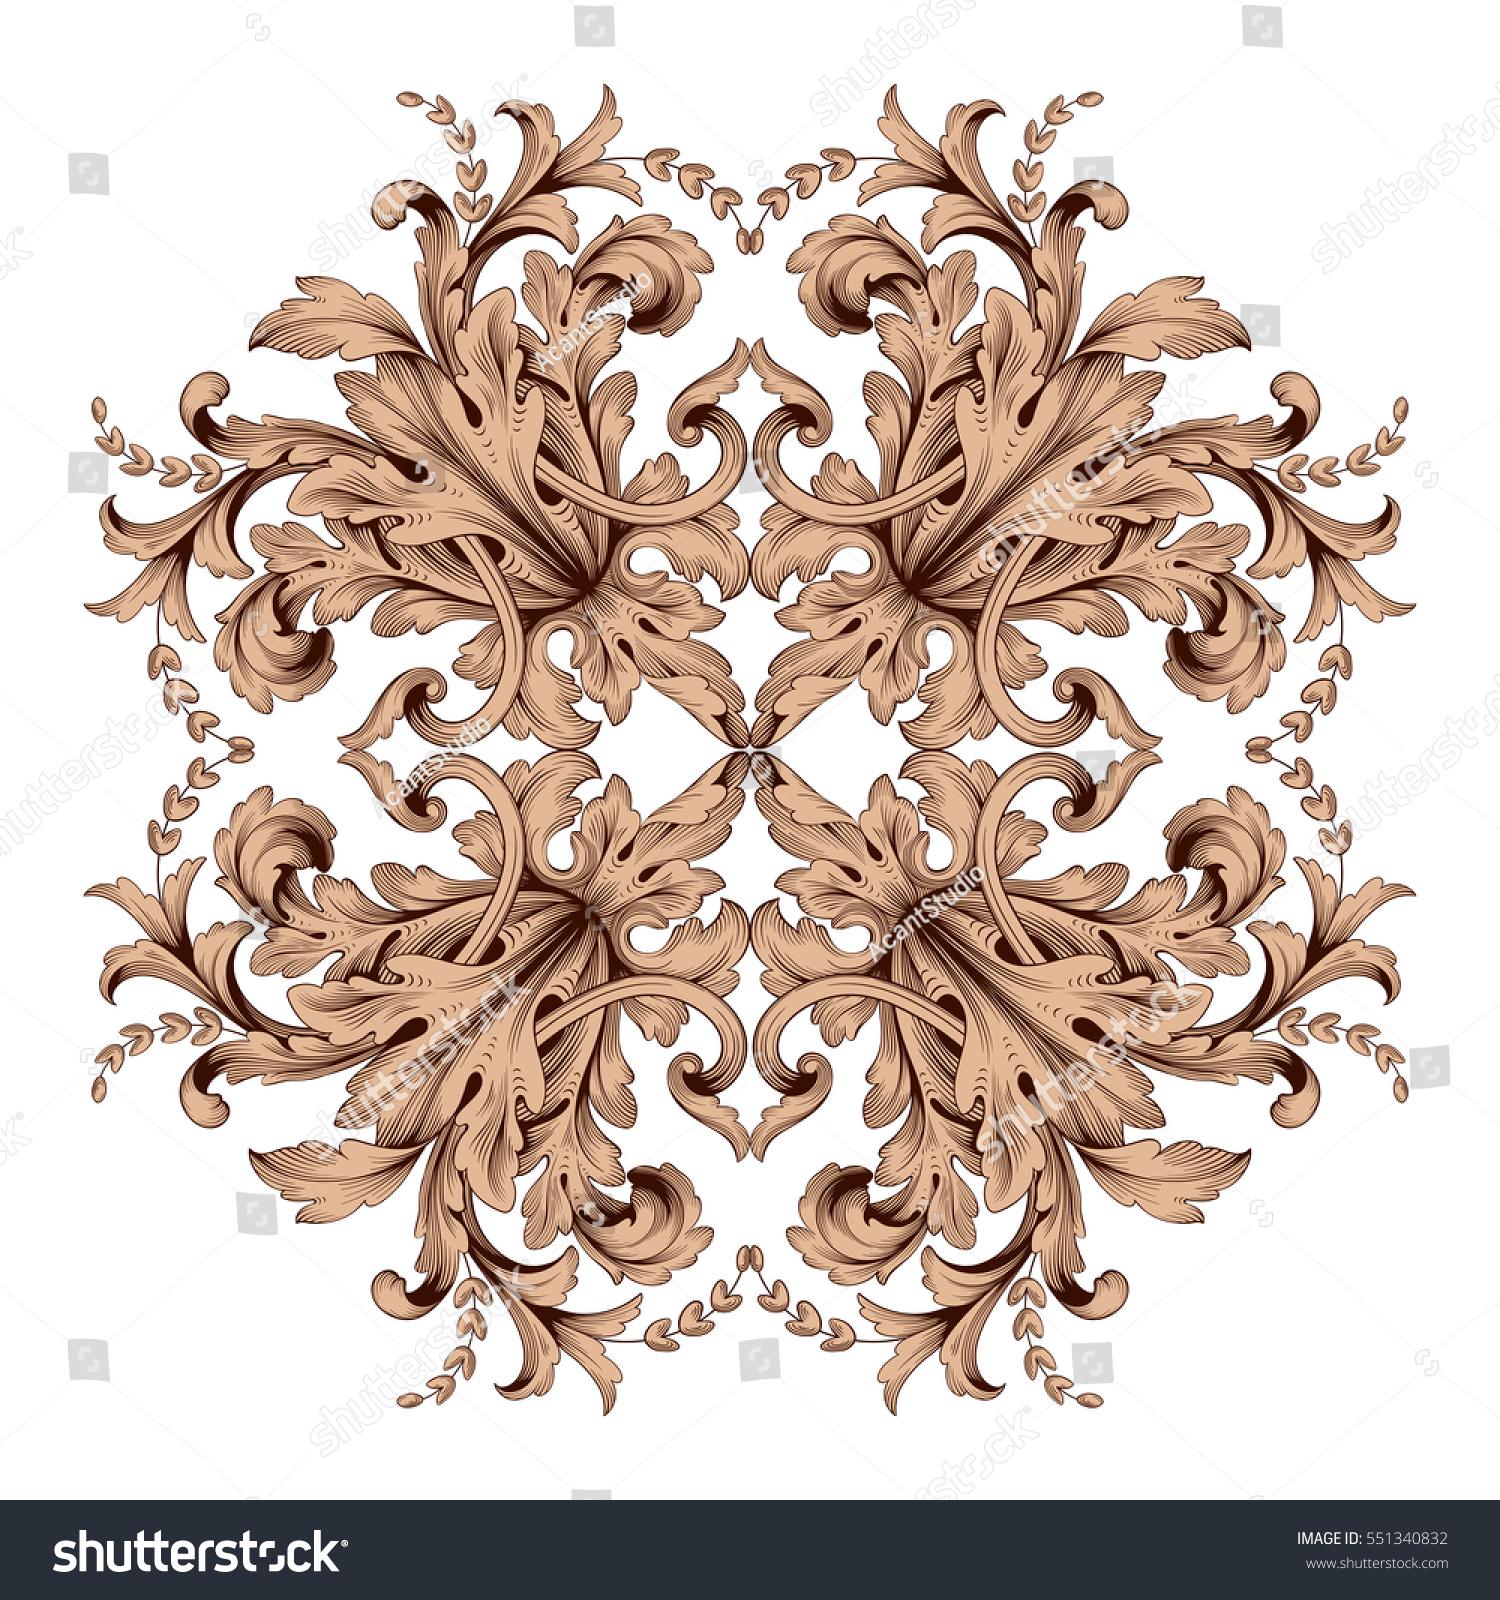 Vintage baroque ornament retro pattern antique stock for Baroque design clothes